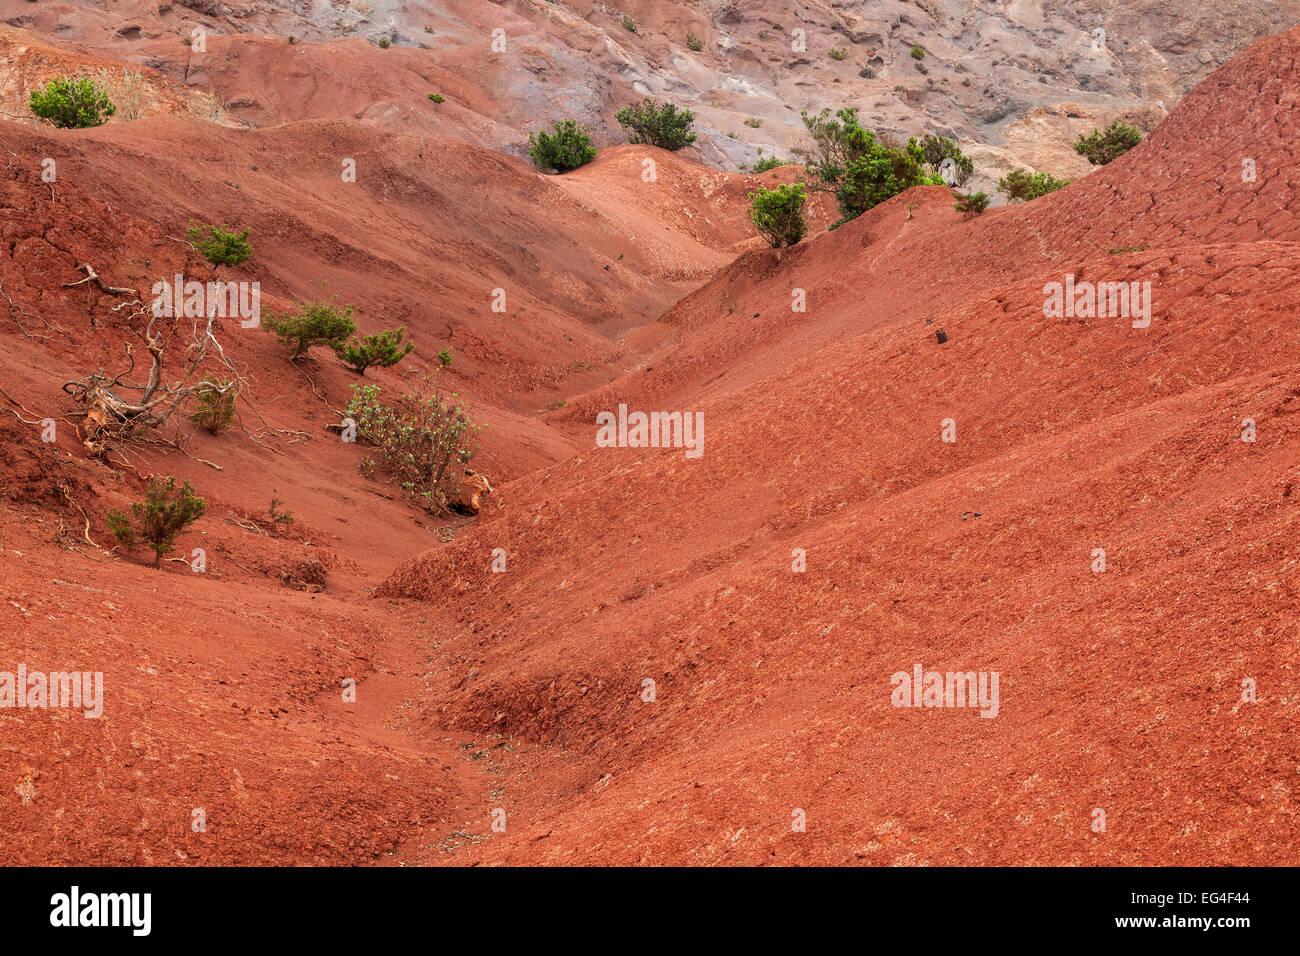 Red soil, erosion, above the scarp slope, Agulo, La Gomera, Canary Islands, Spain - Stock Image